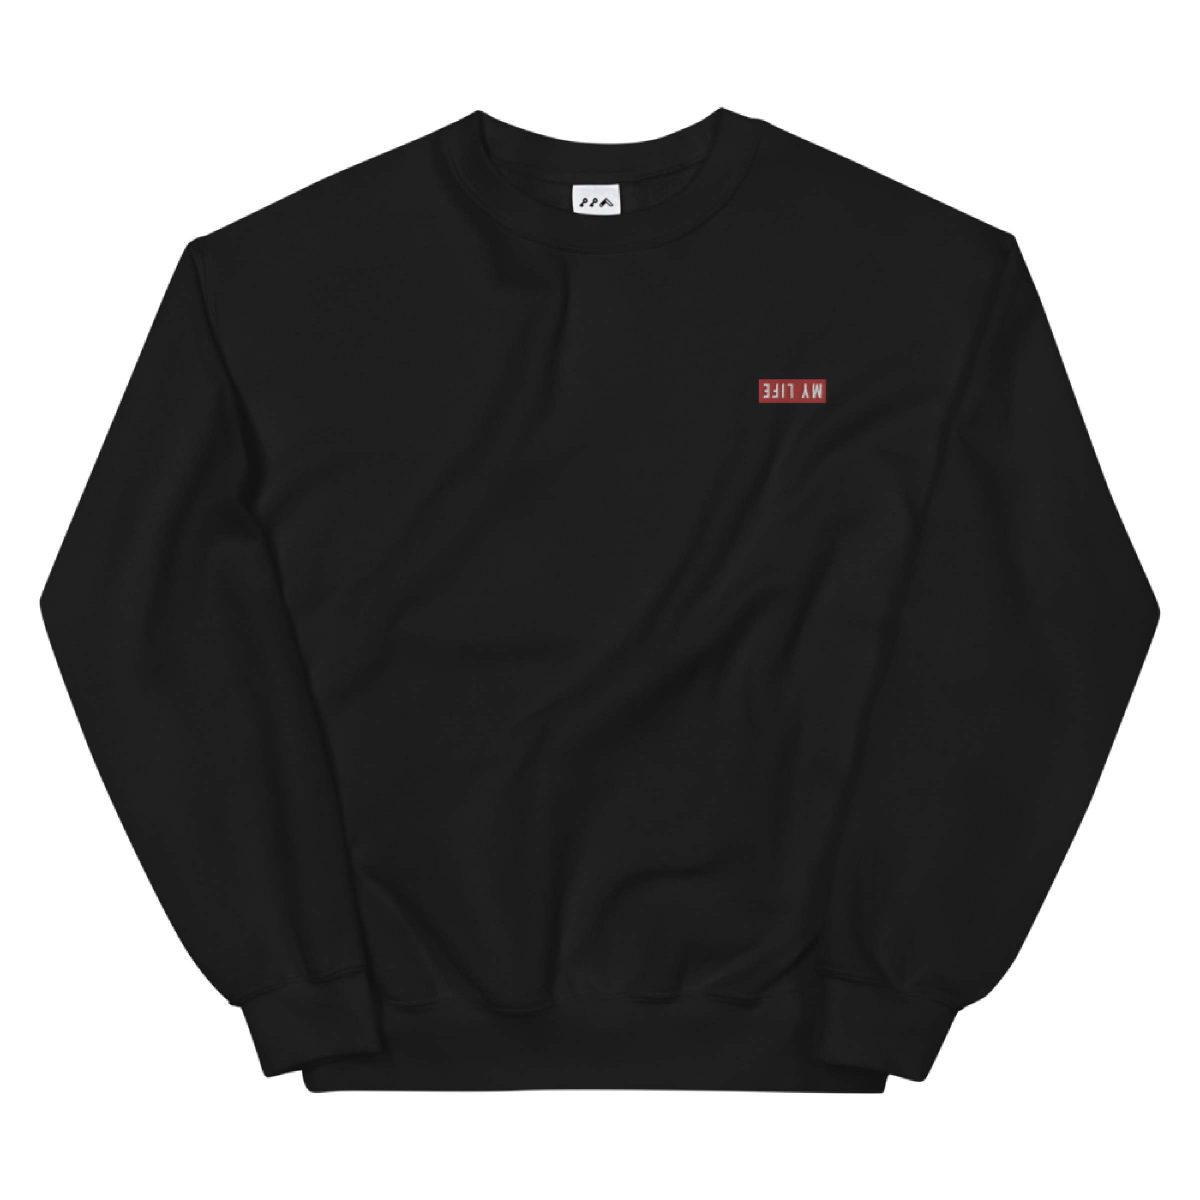 MY LIFE embroidered sweatshirt by kikicutt sweatshirt store